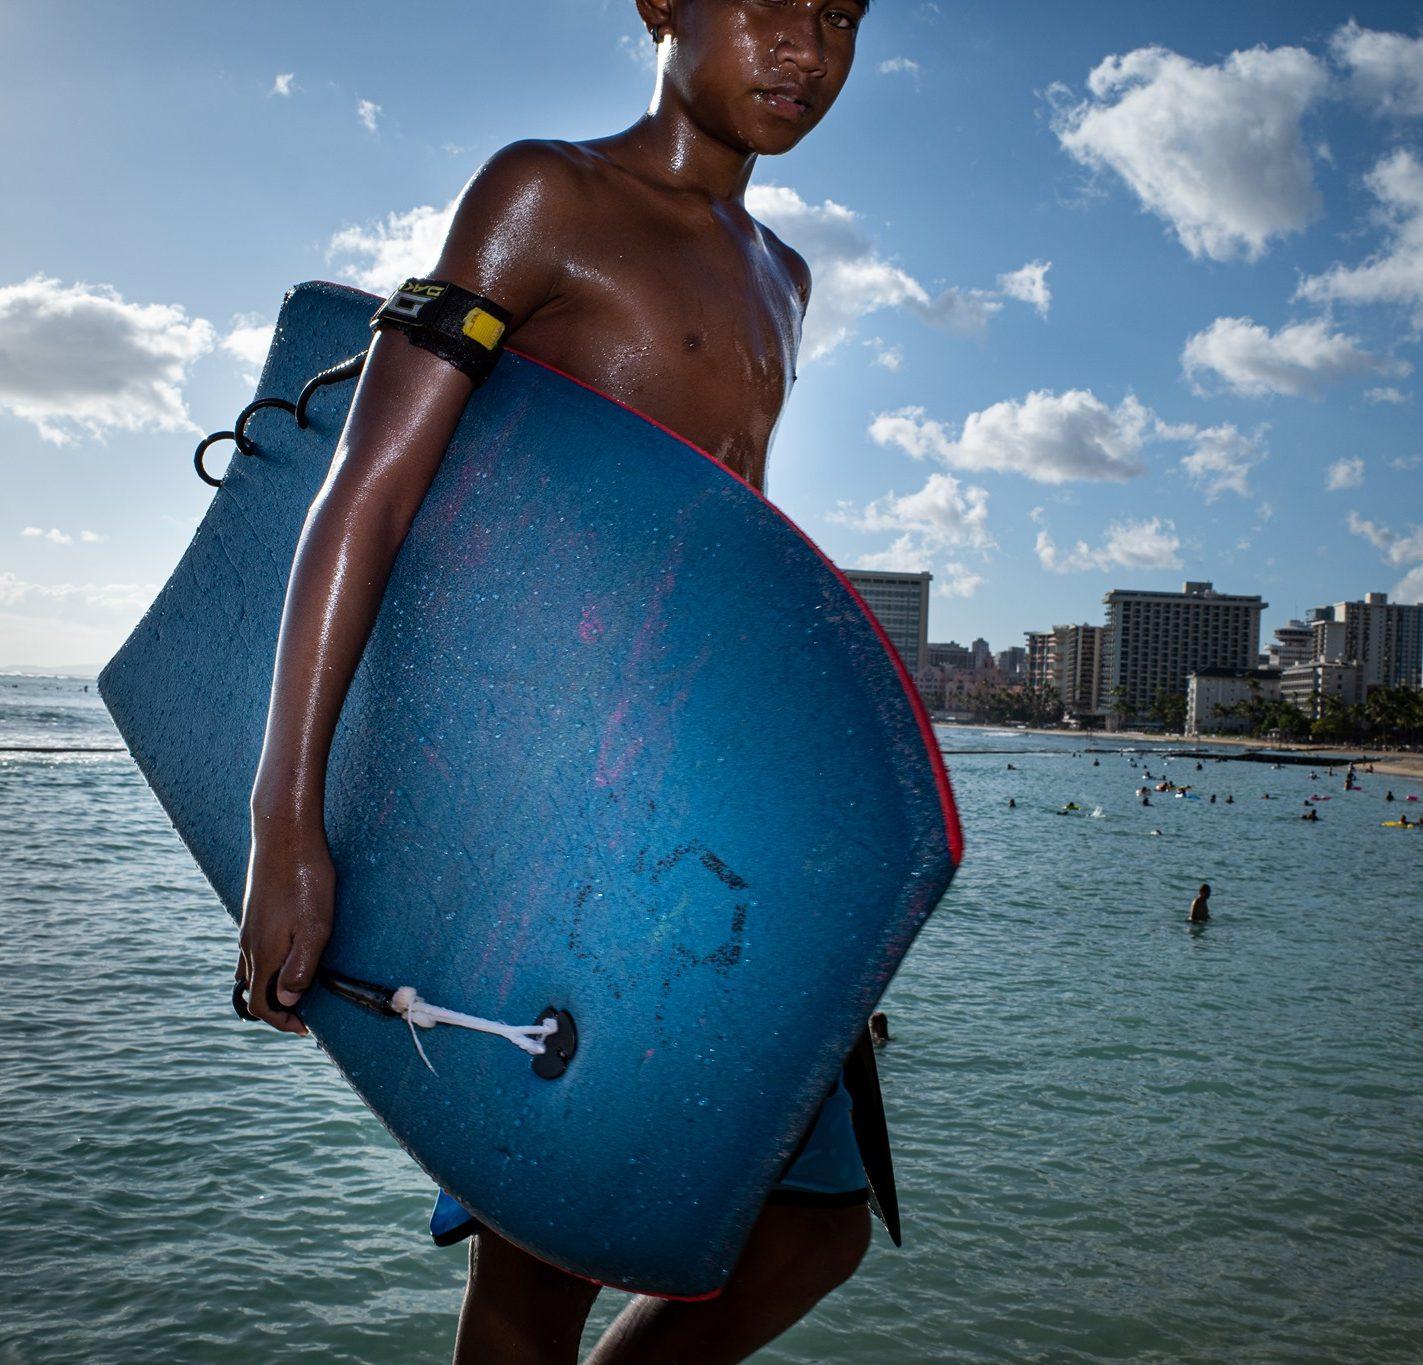 Tim Huynh | Street Photography